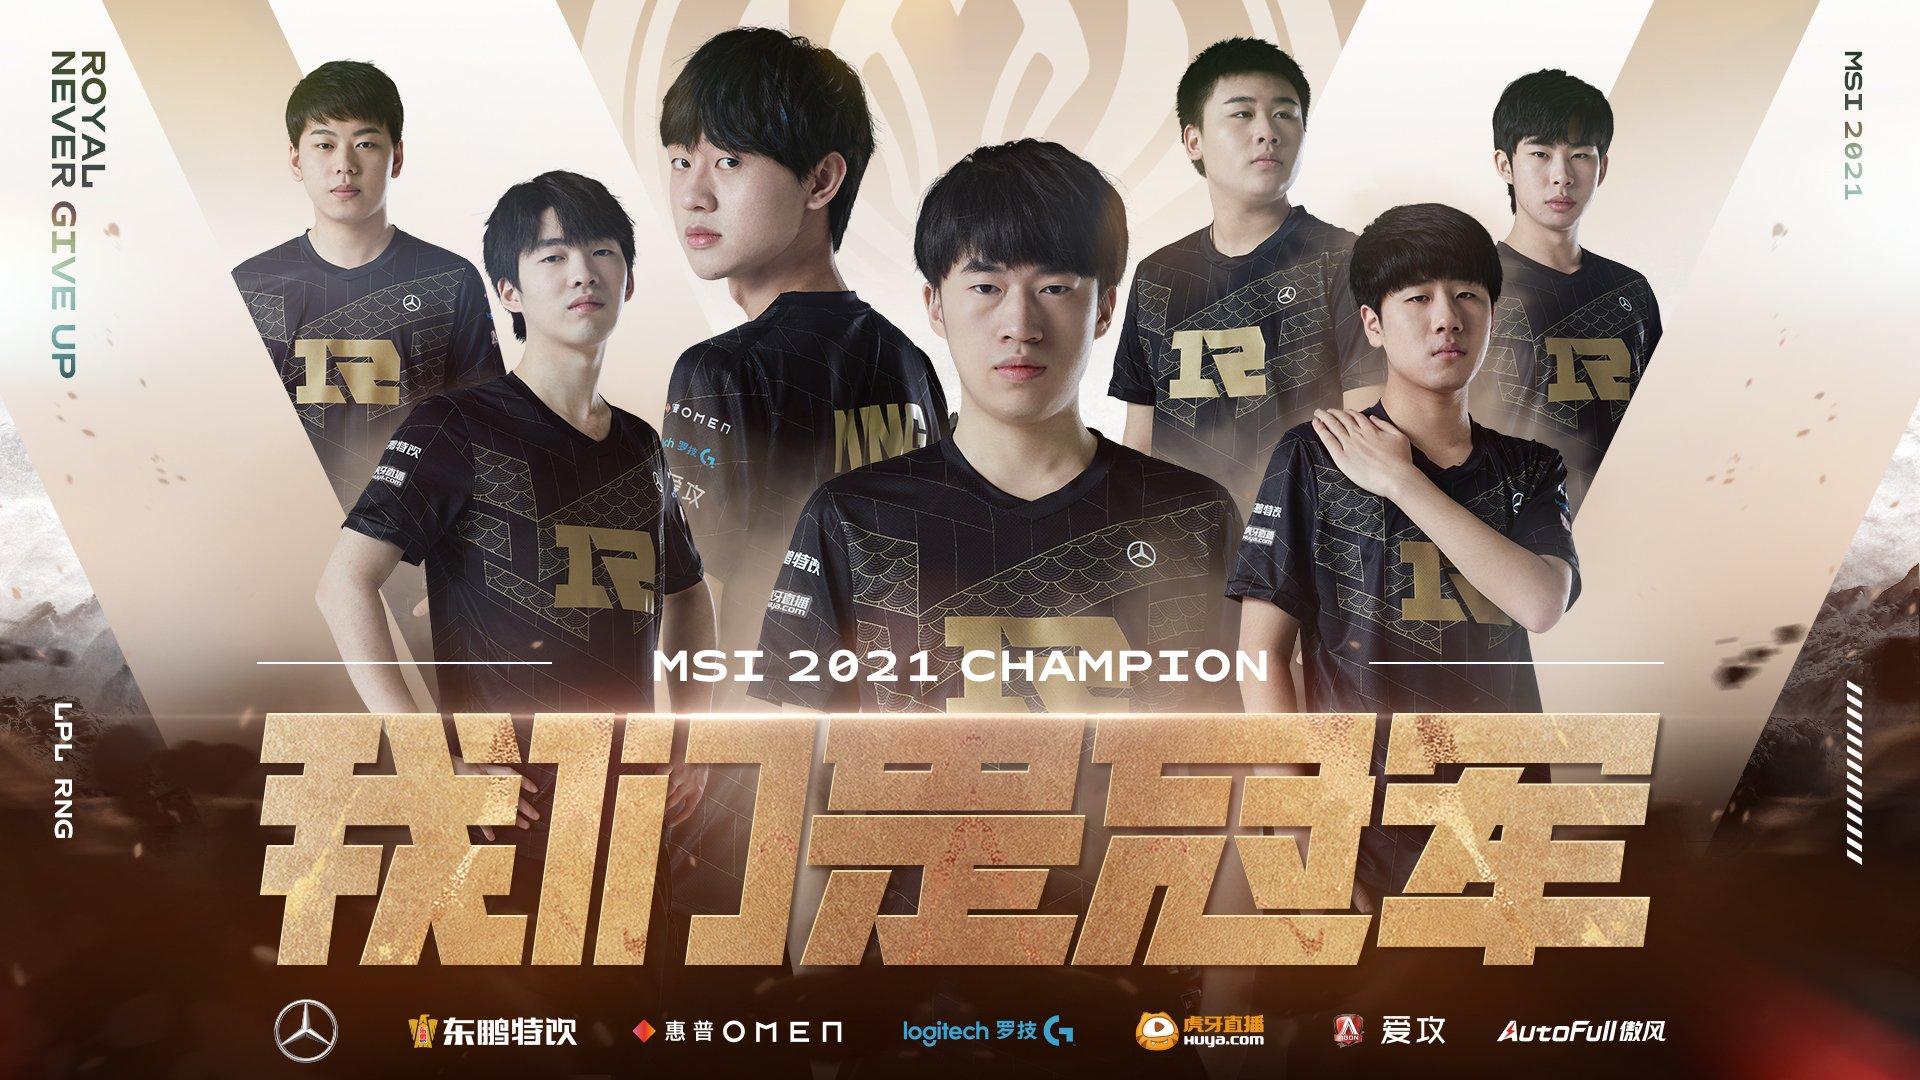 rng champion msi 2021